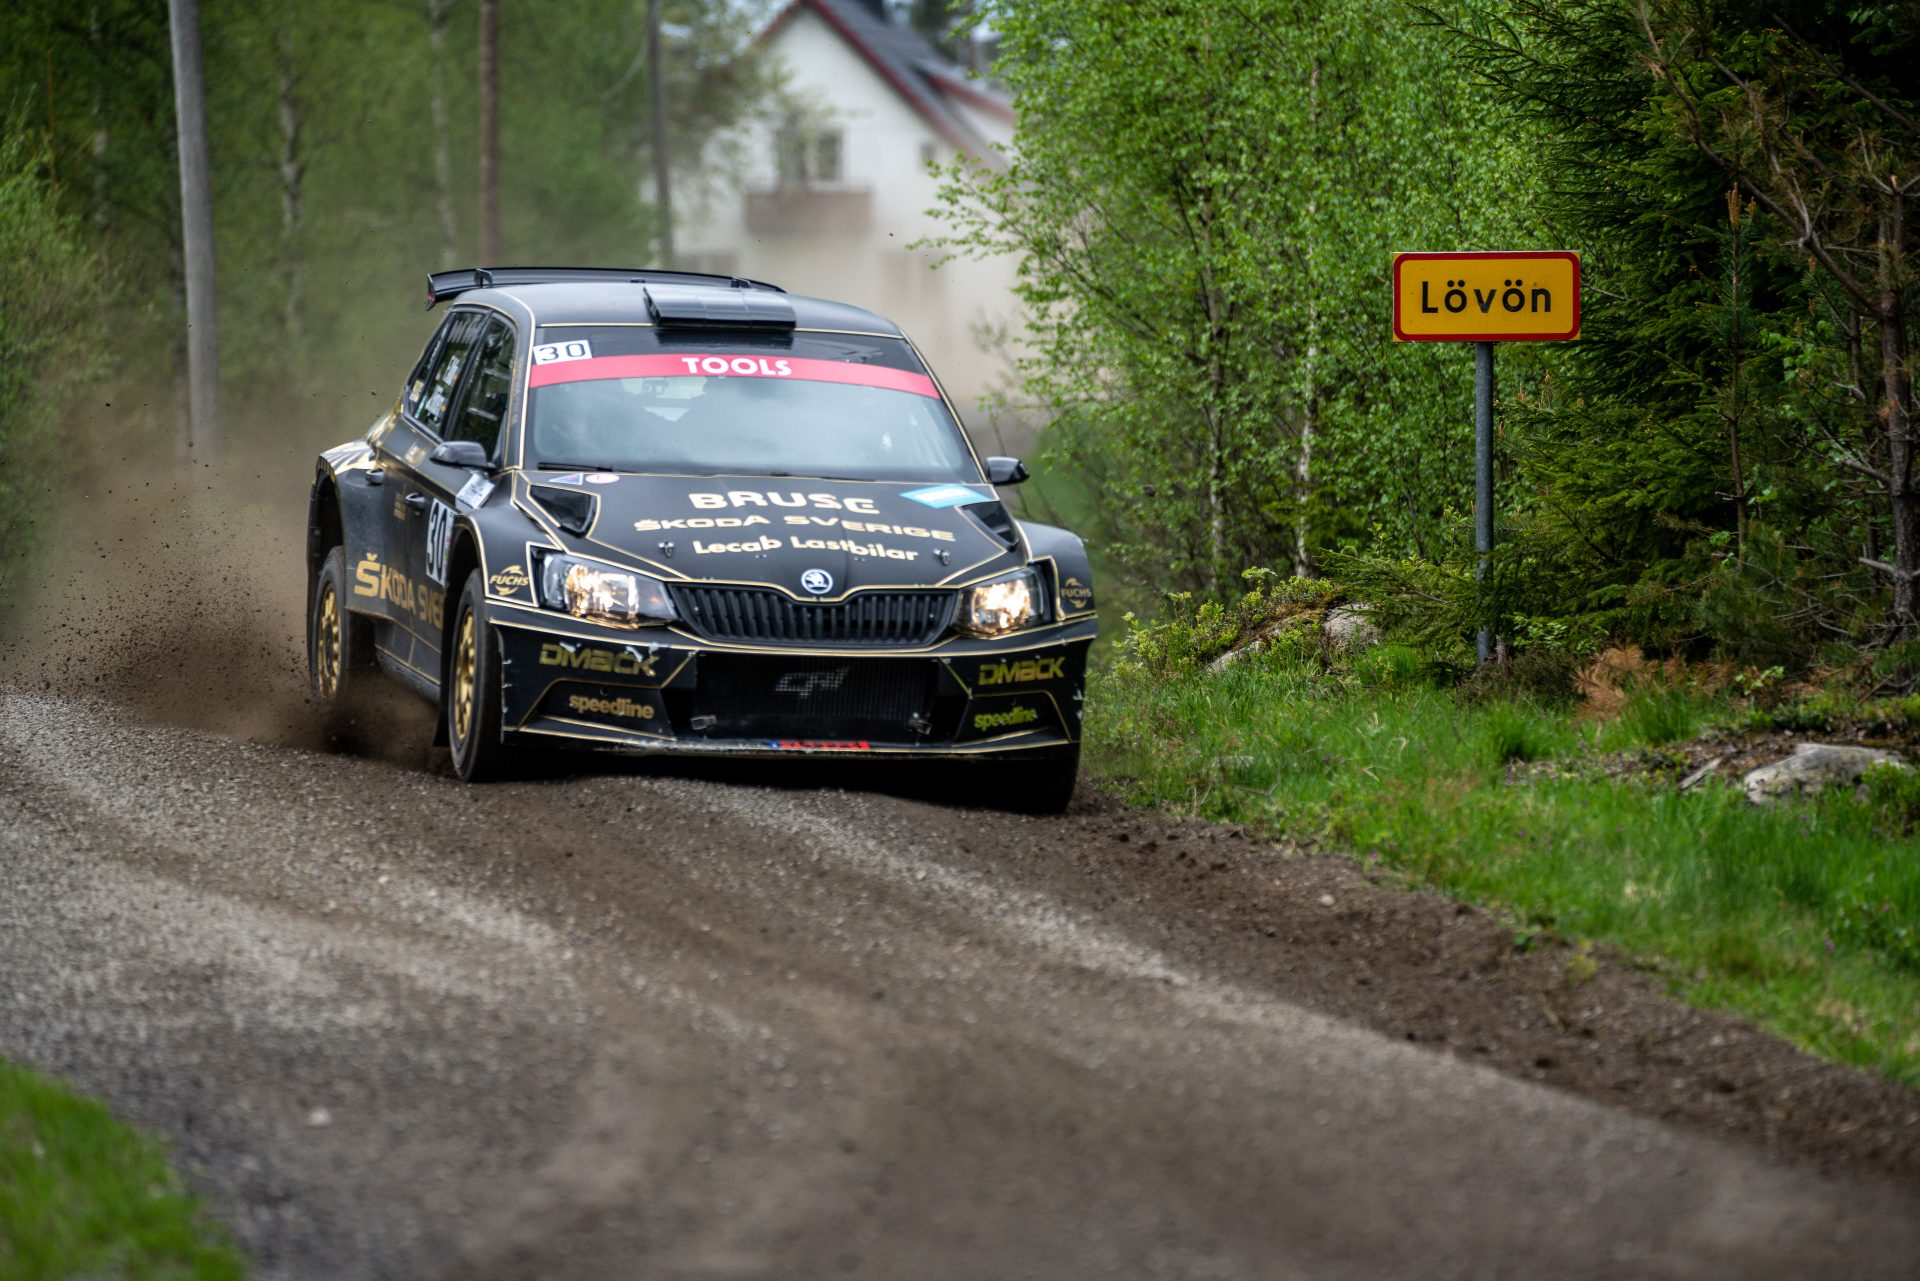 Fredrik Åhlin: The Story of a Comeback | Customer Teams